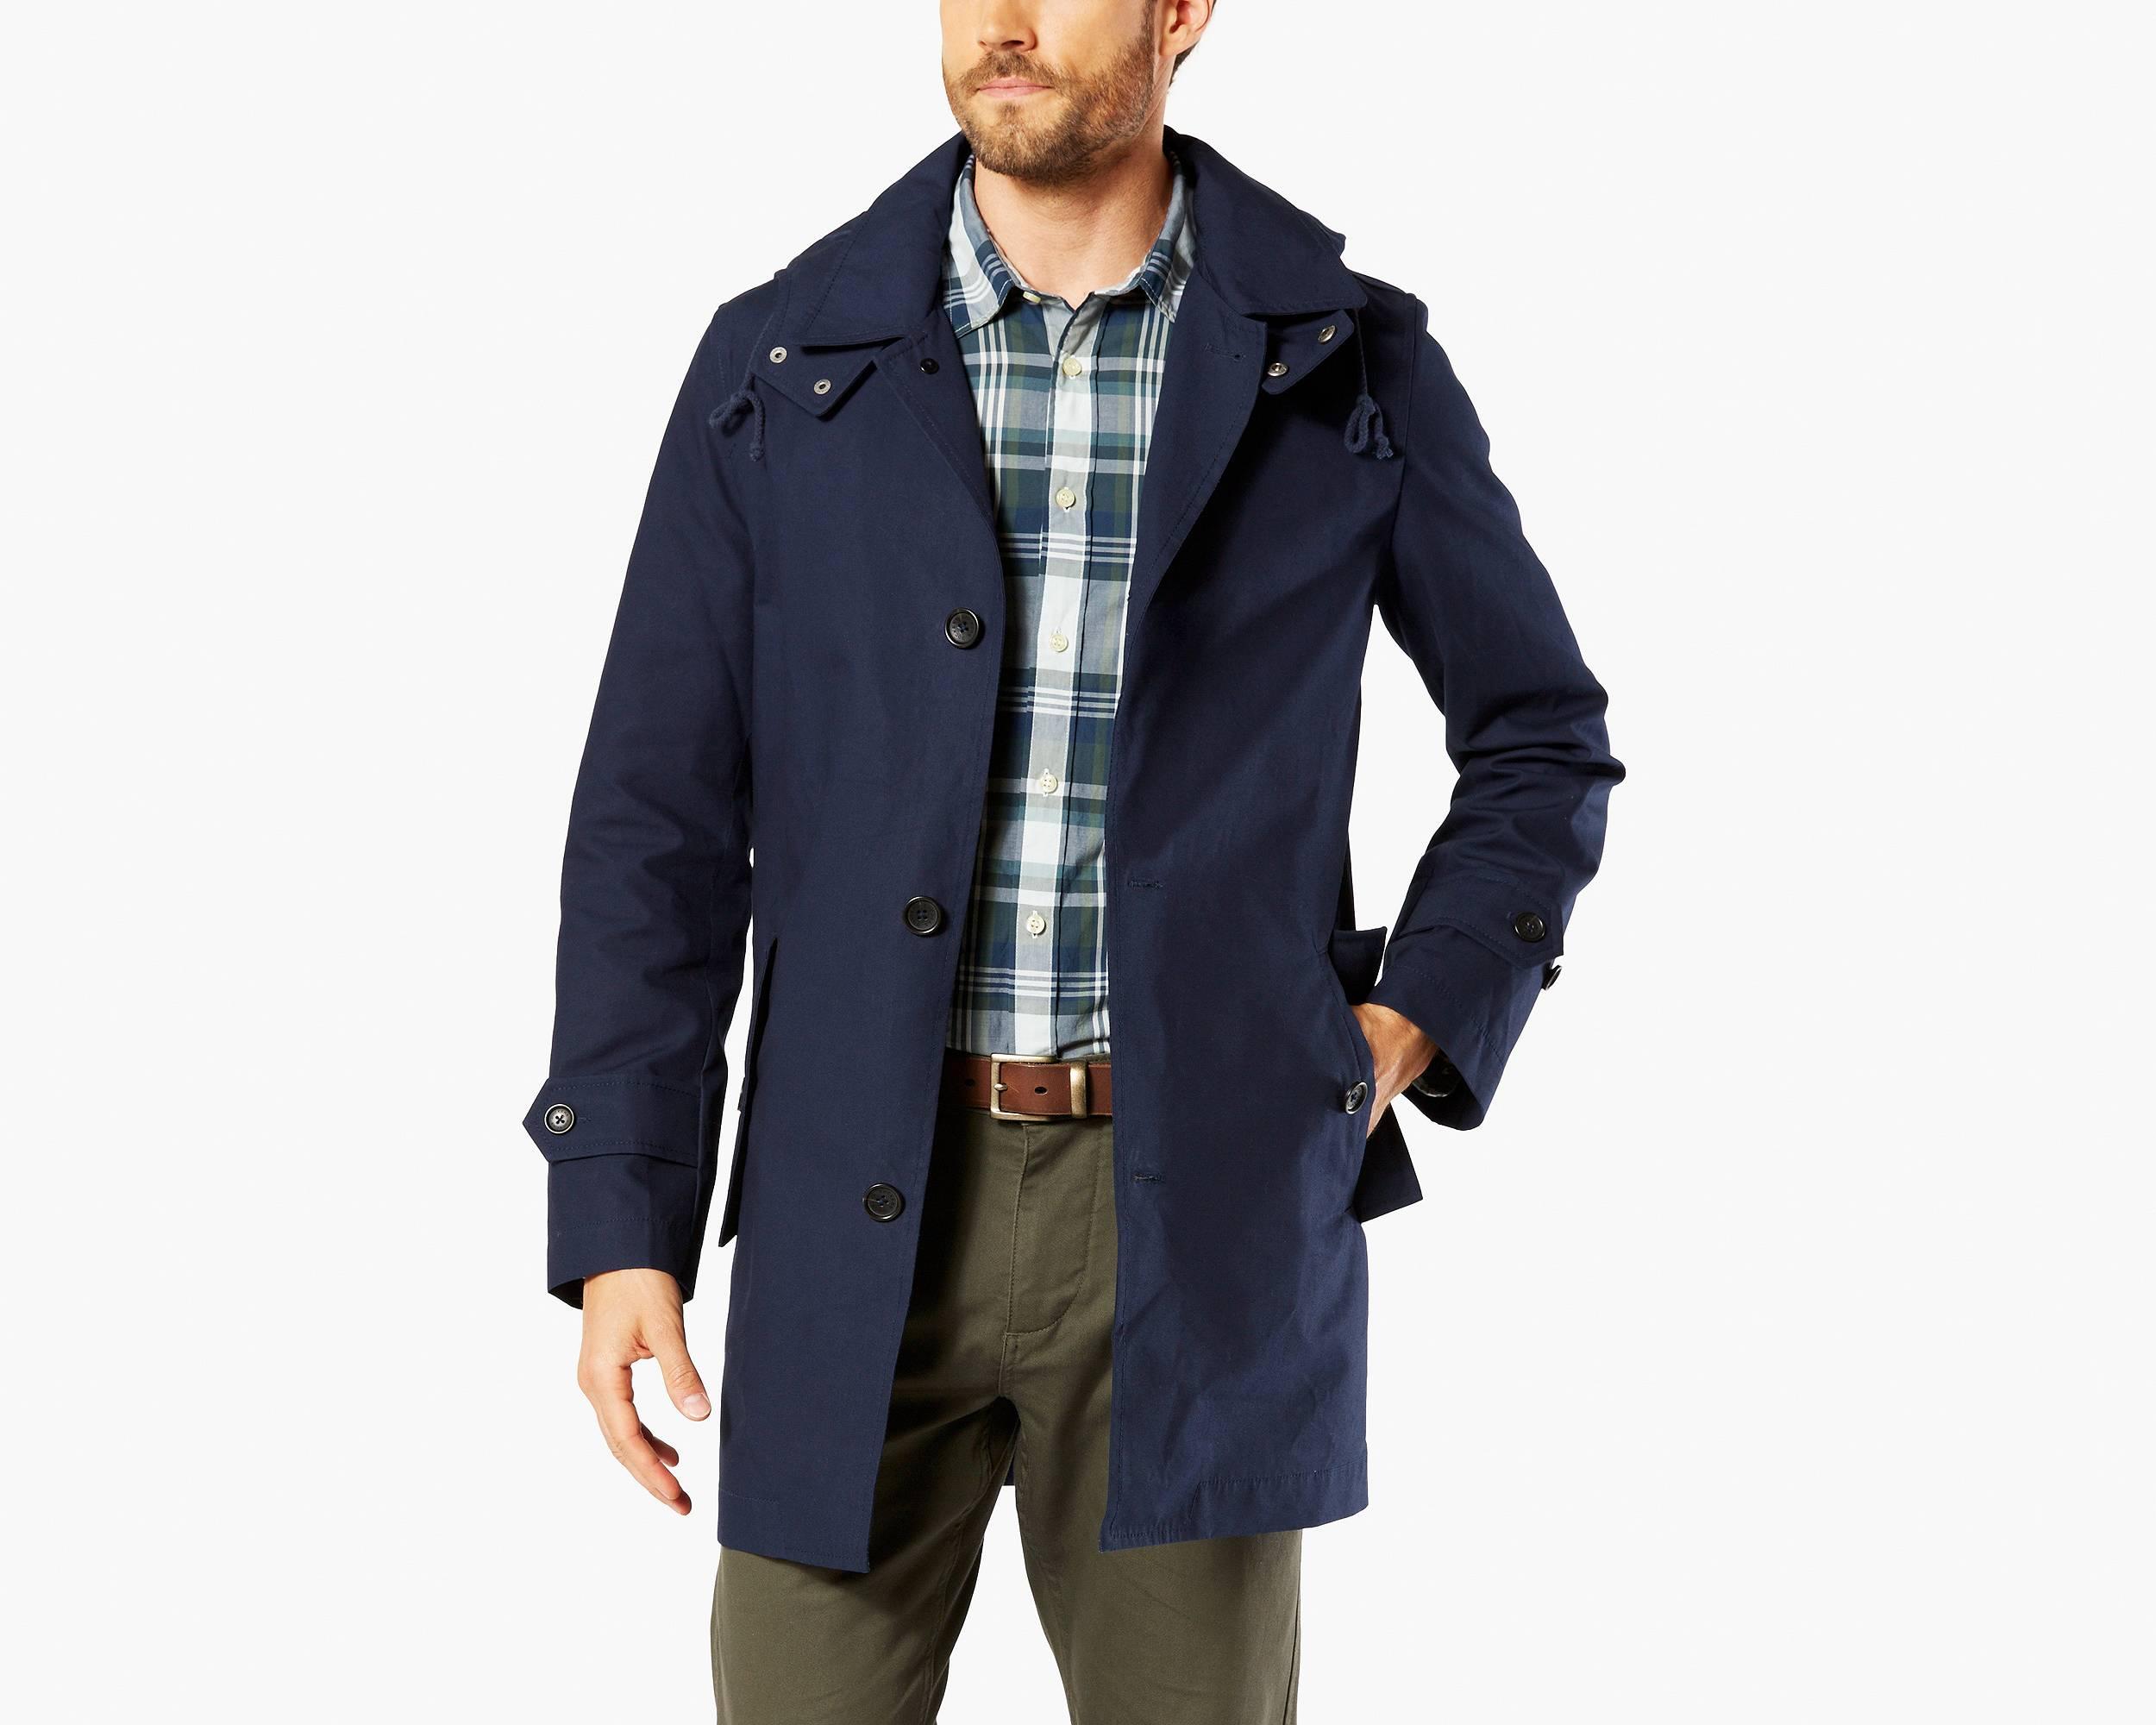 Mens khaki jacket casual - Quick View